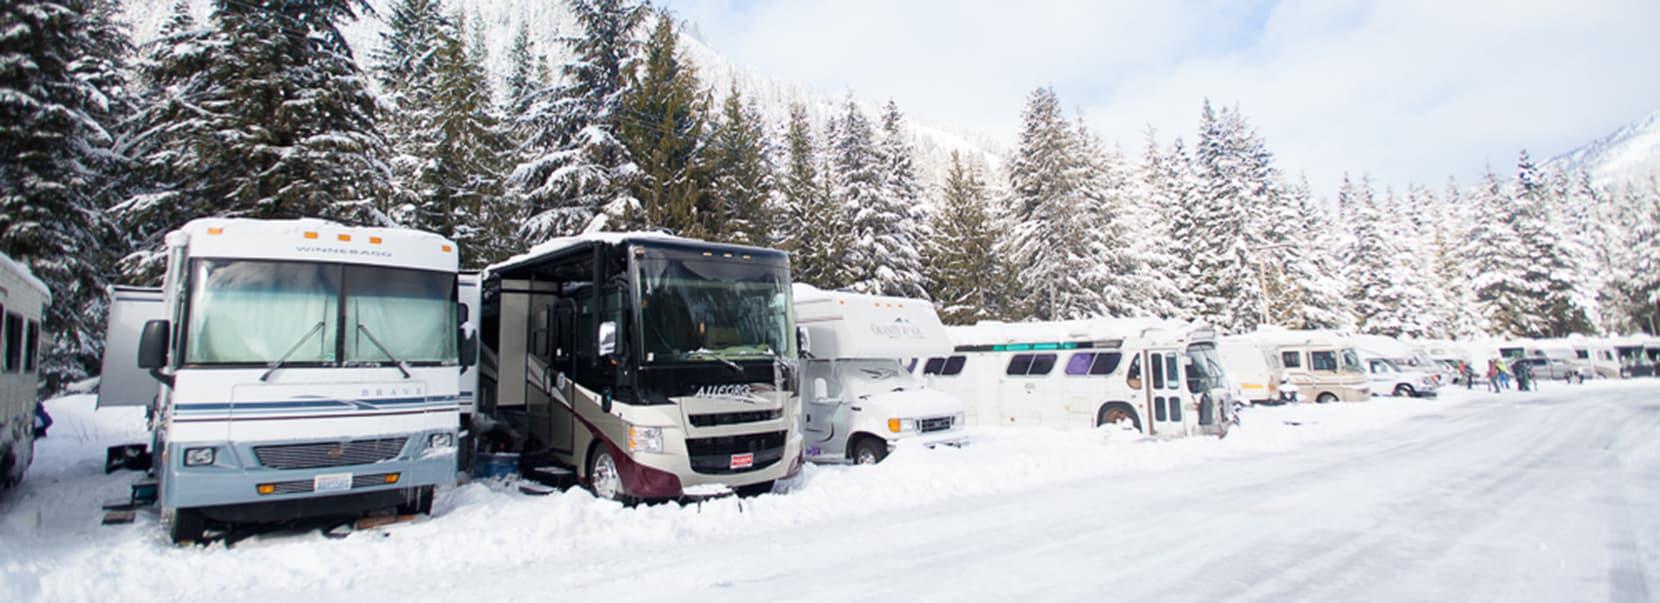 Crystal Mountain Resort RV